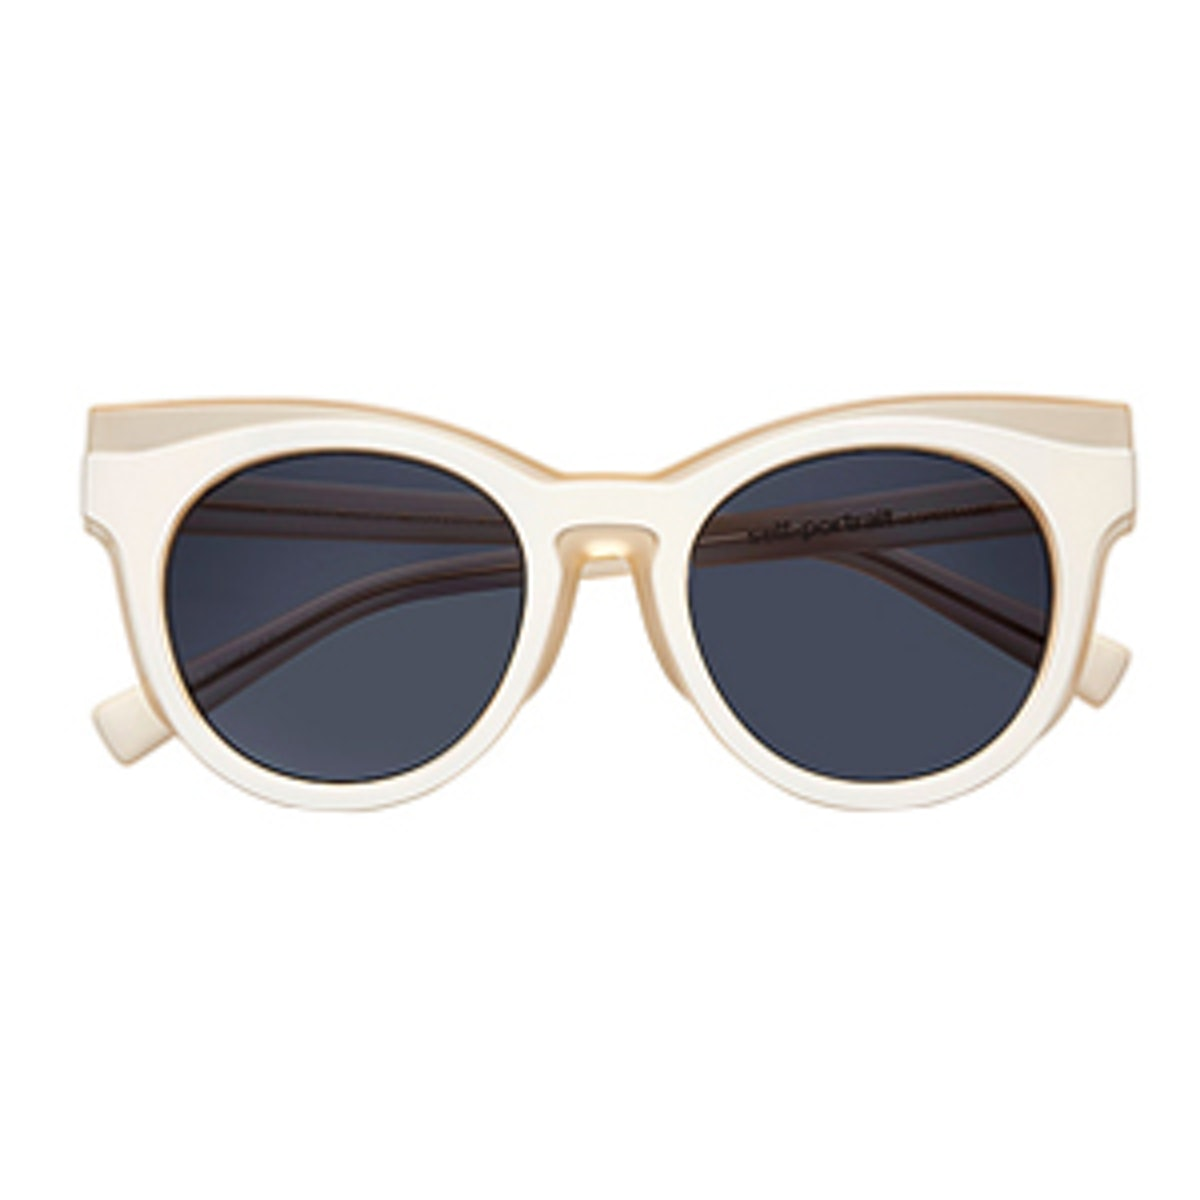 Edition Three Sunglasses